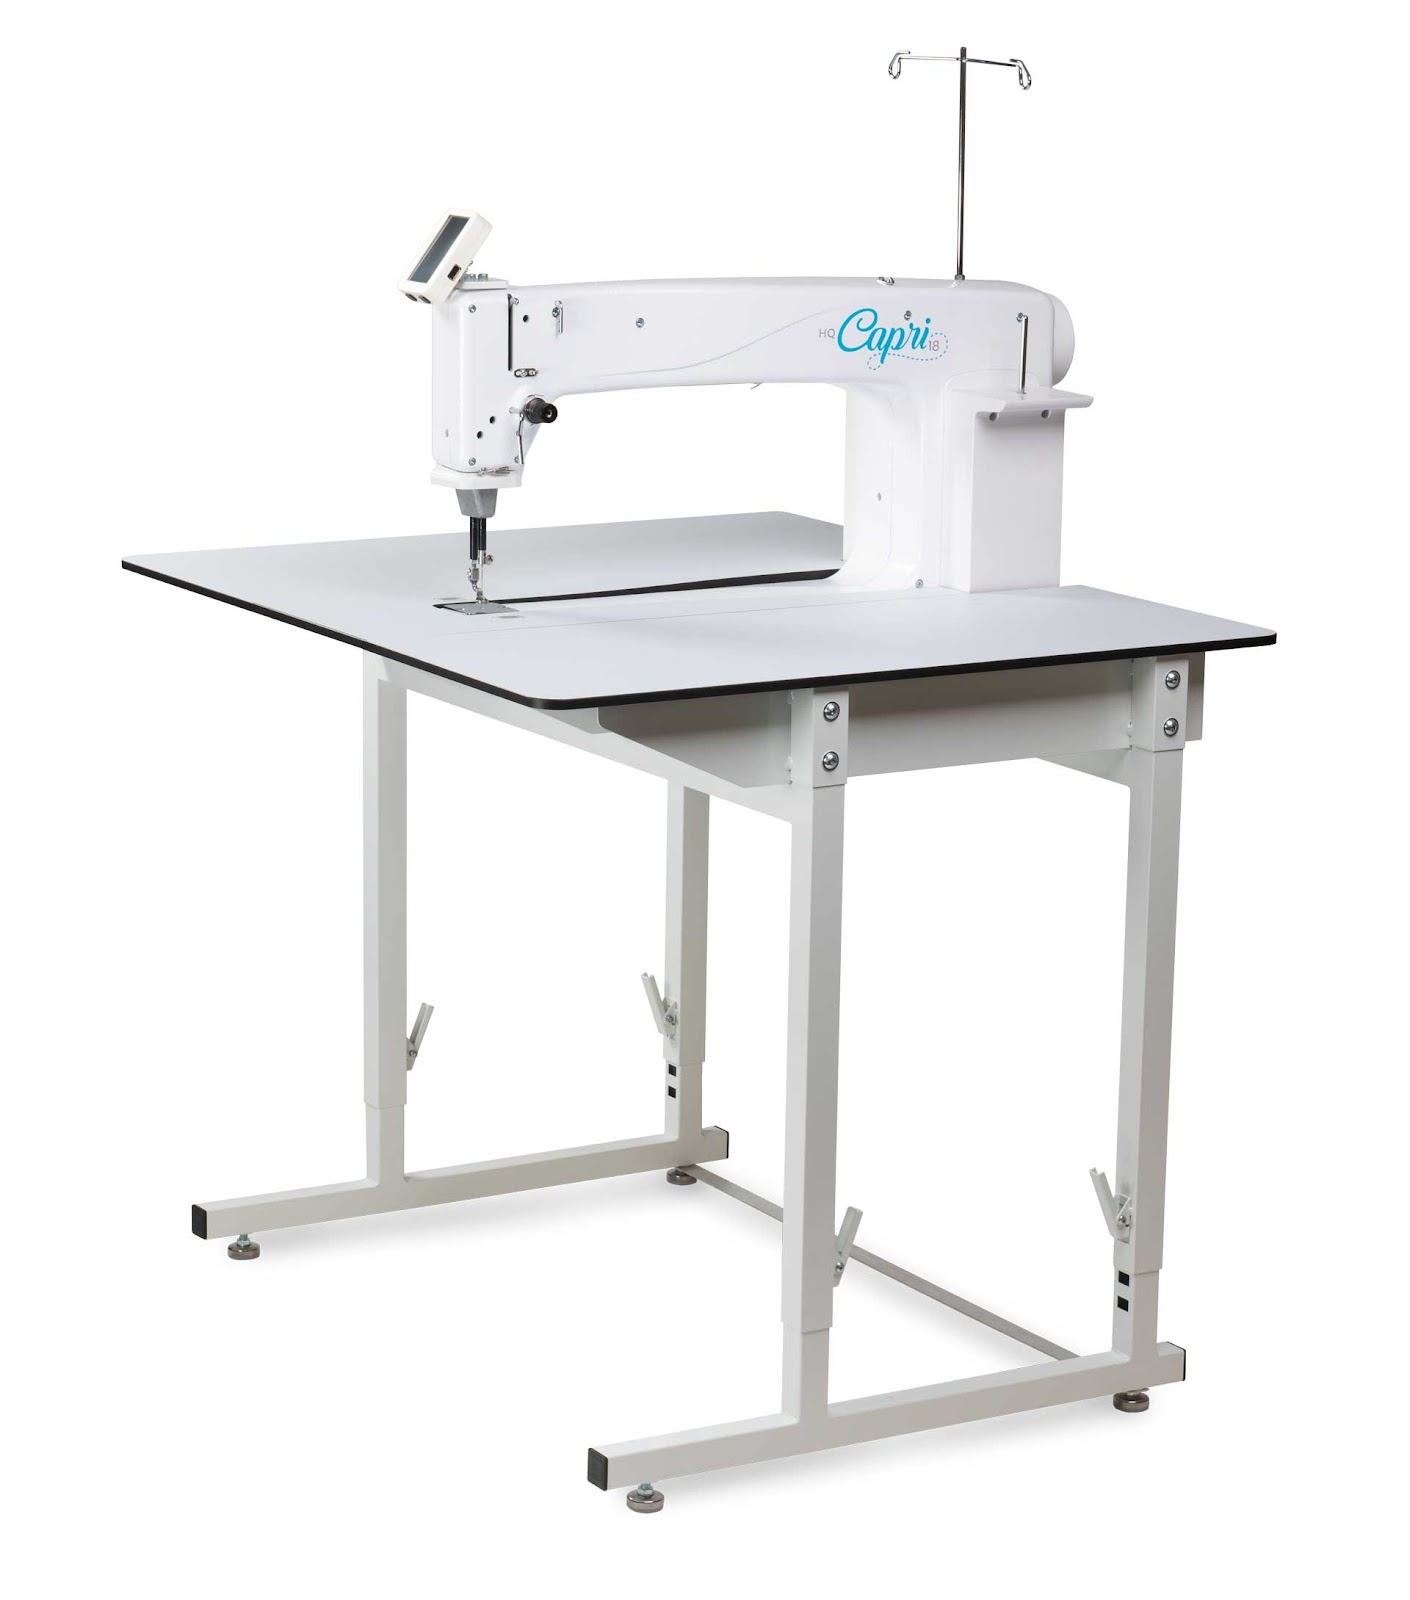 Capri Machine with Table